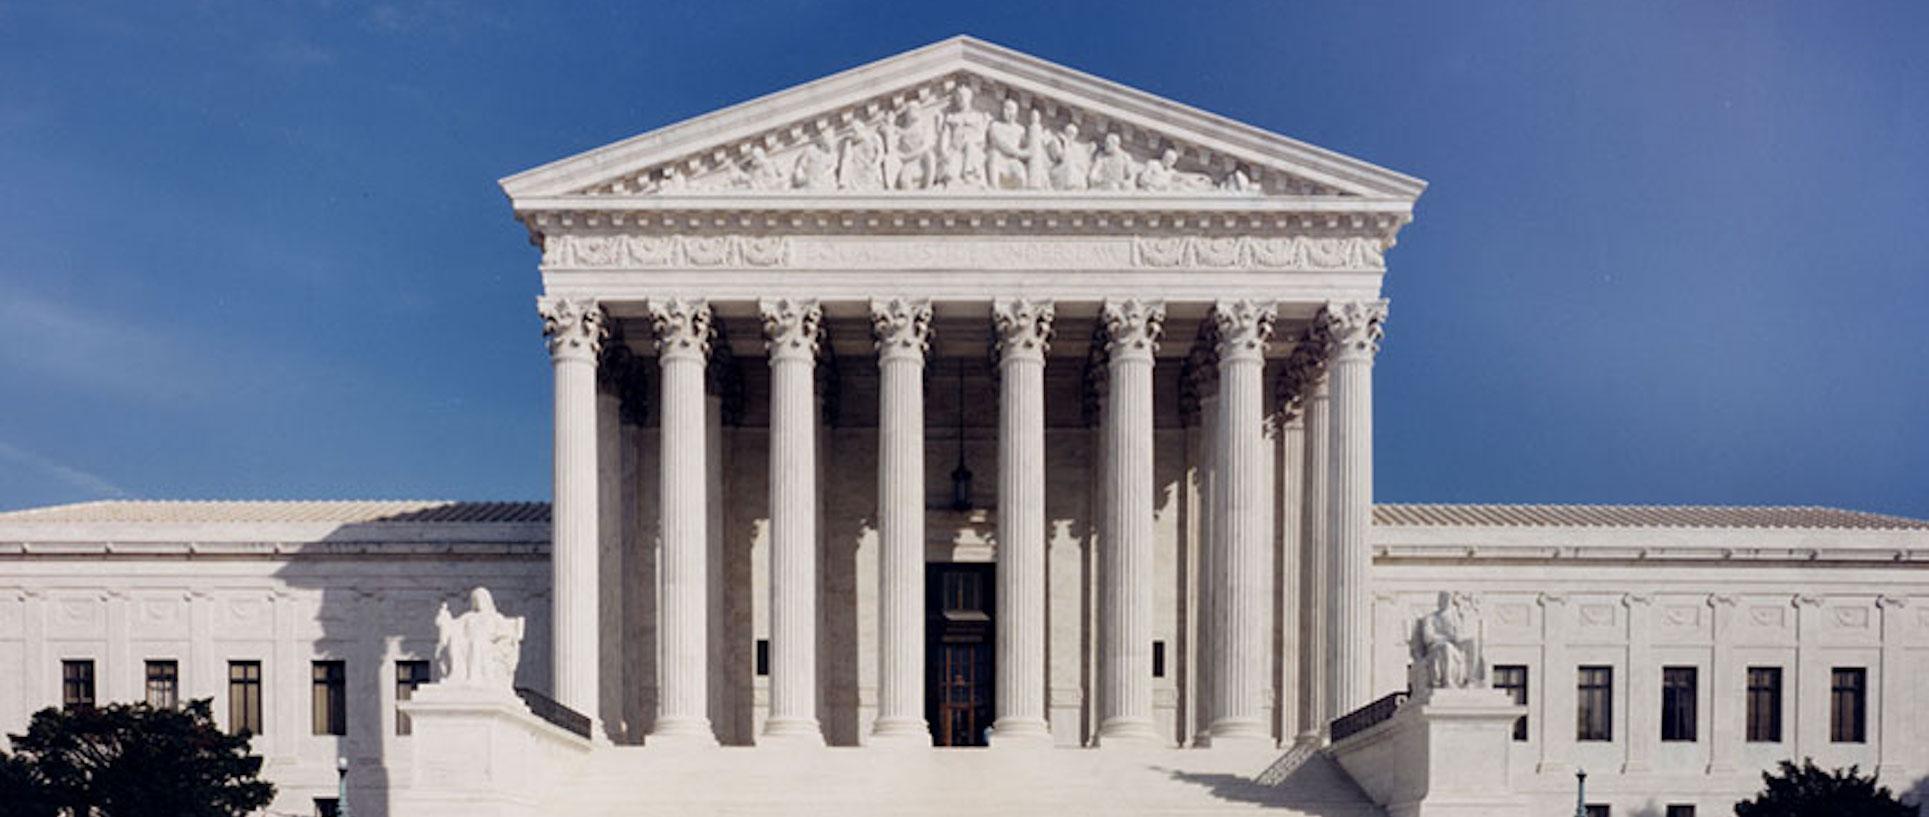 A legal break for Dreamers